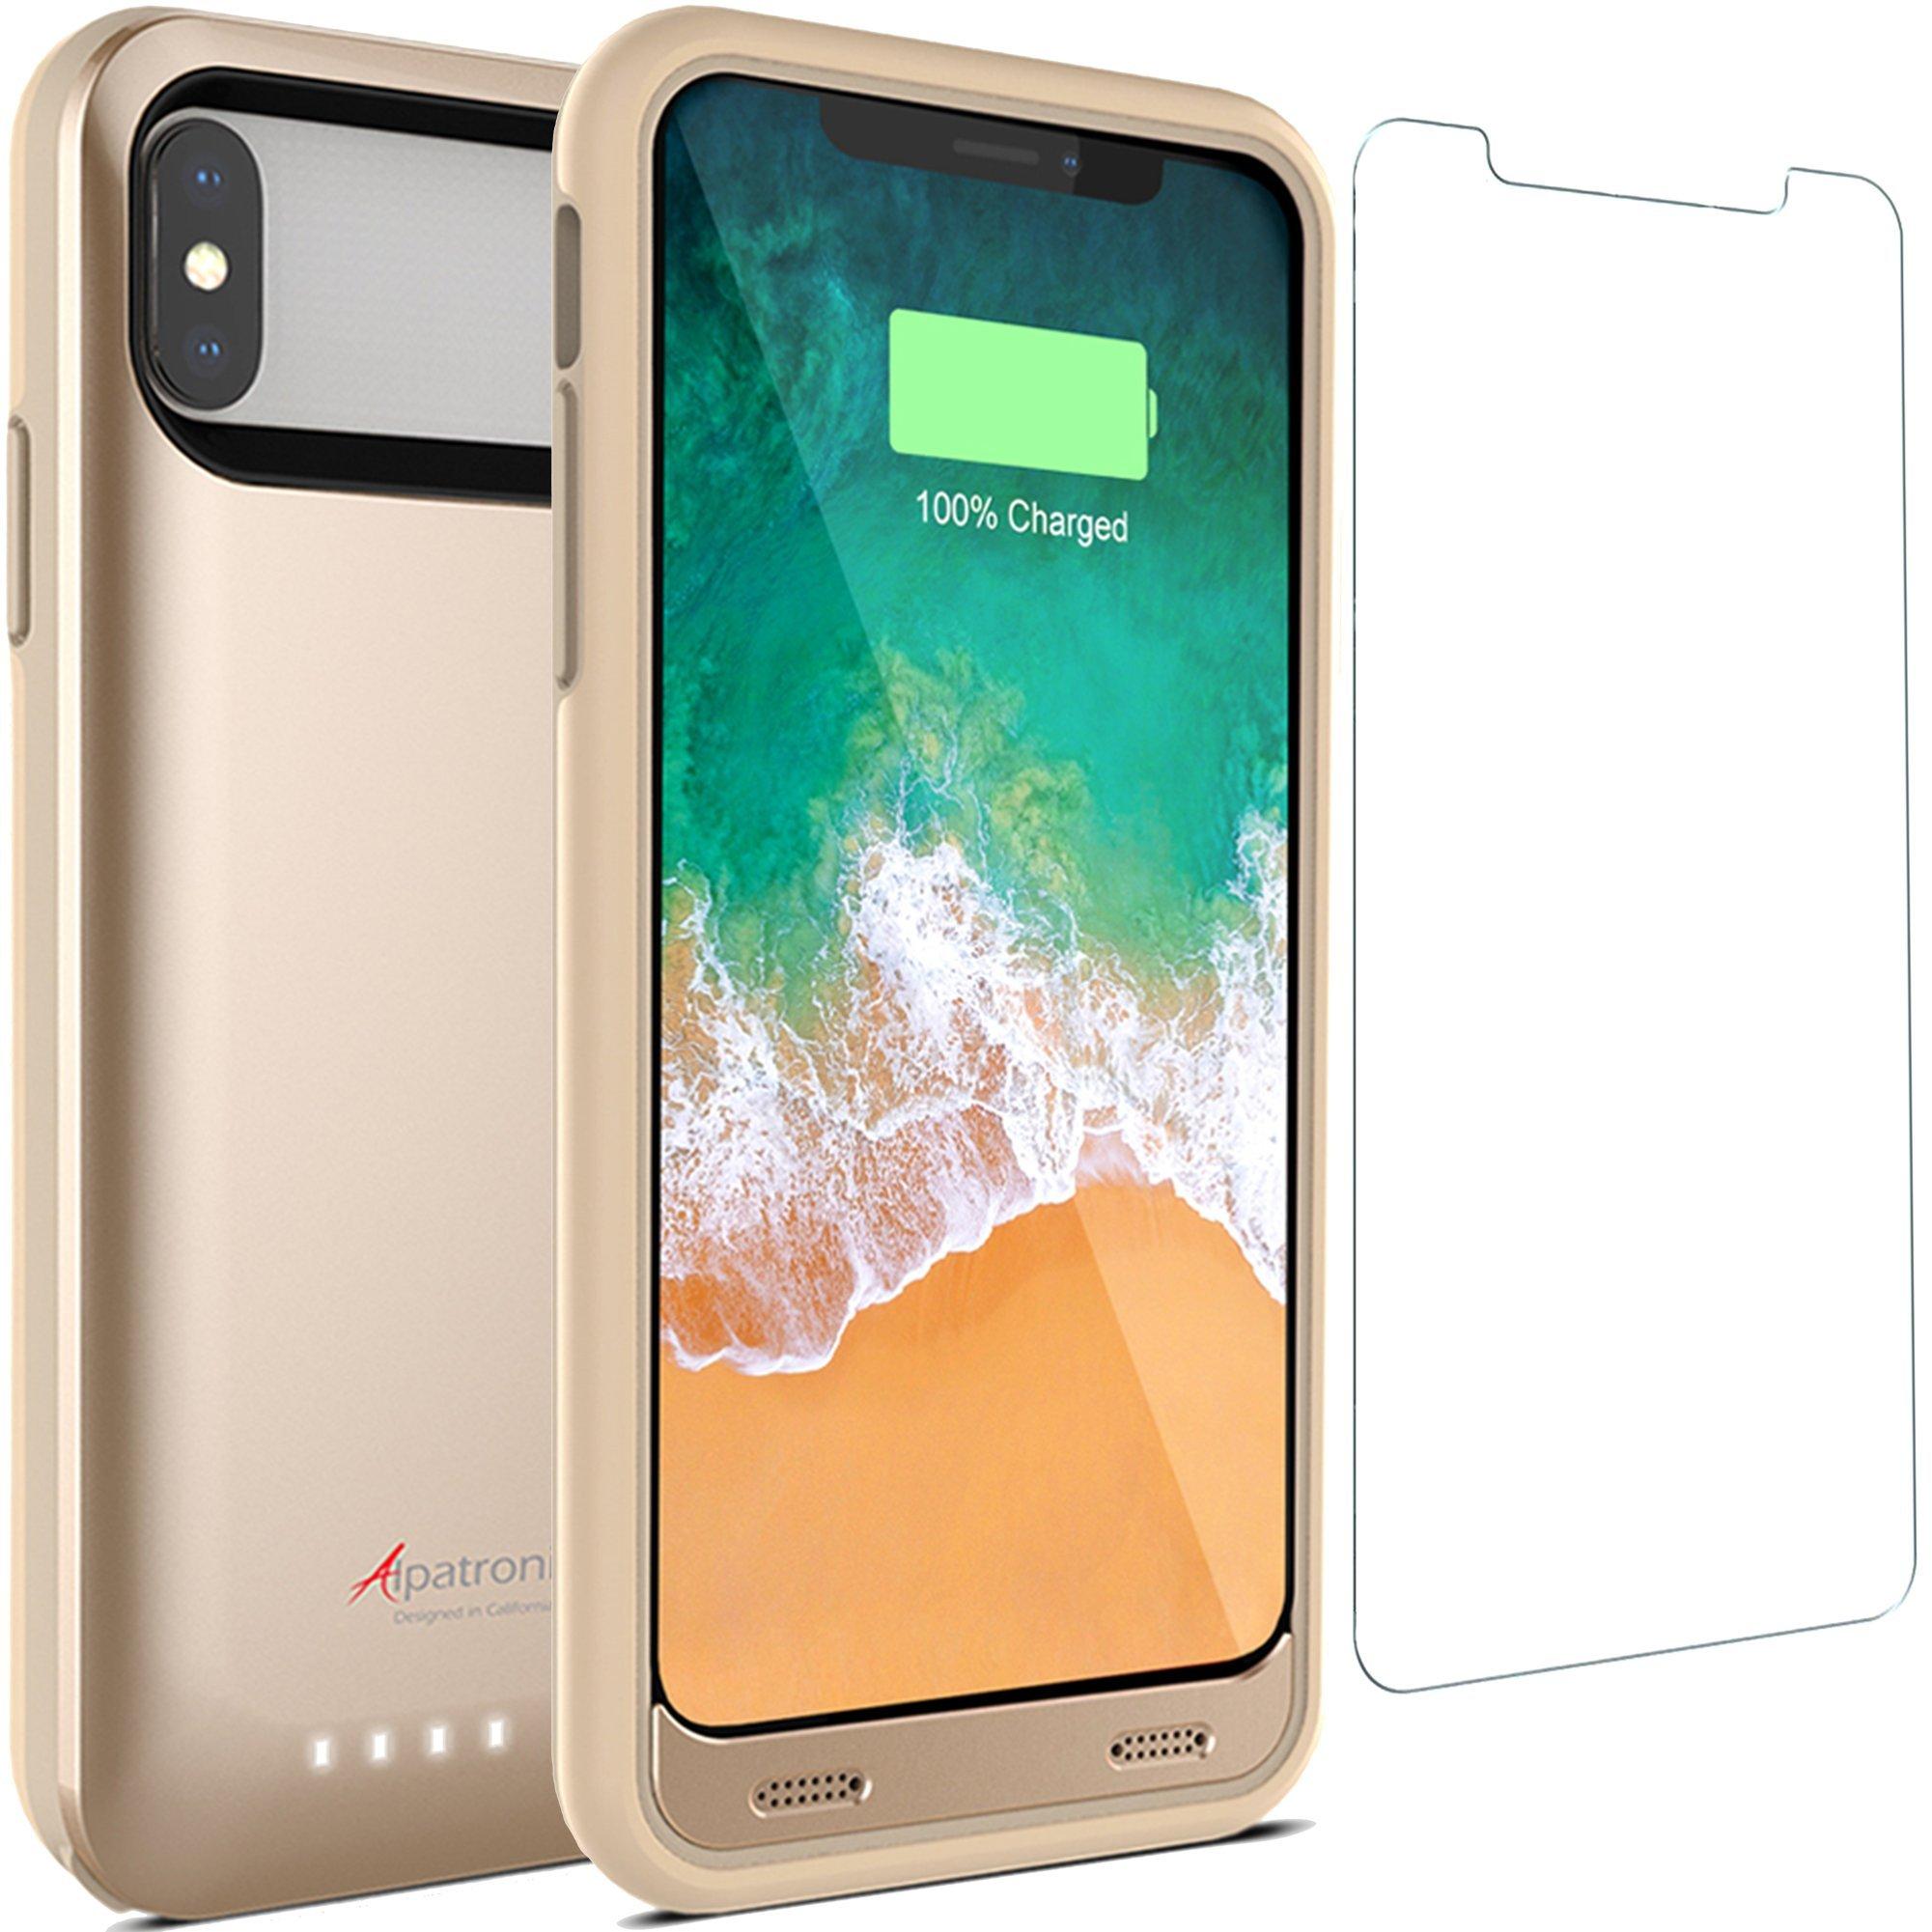 Funda Con Bateria de 4000mah para Apple Iphone X/Xs ALPATRONIX [76RJ3Q7J]